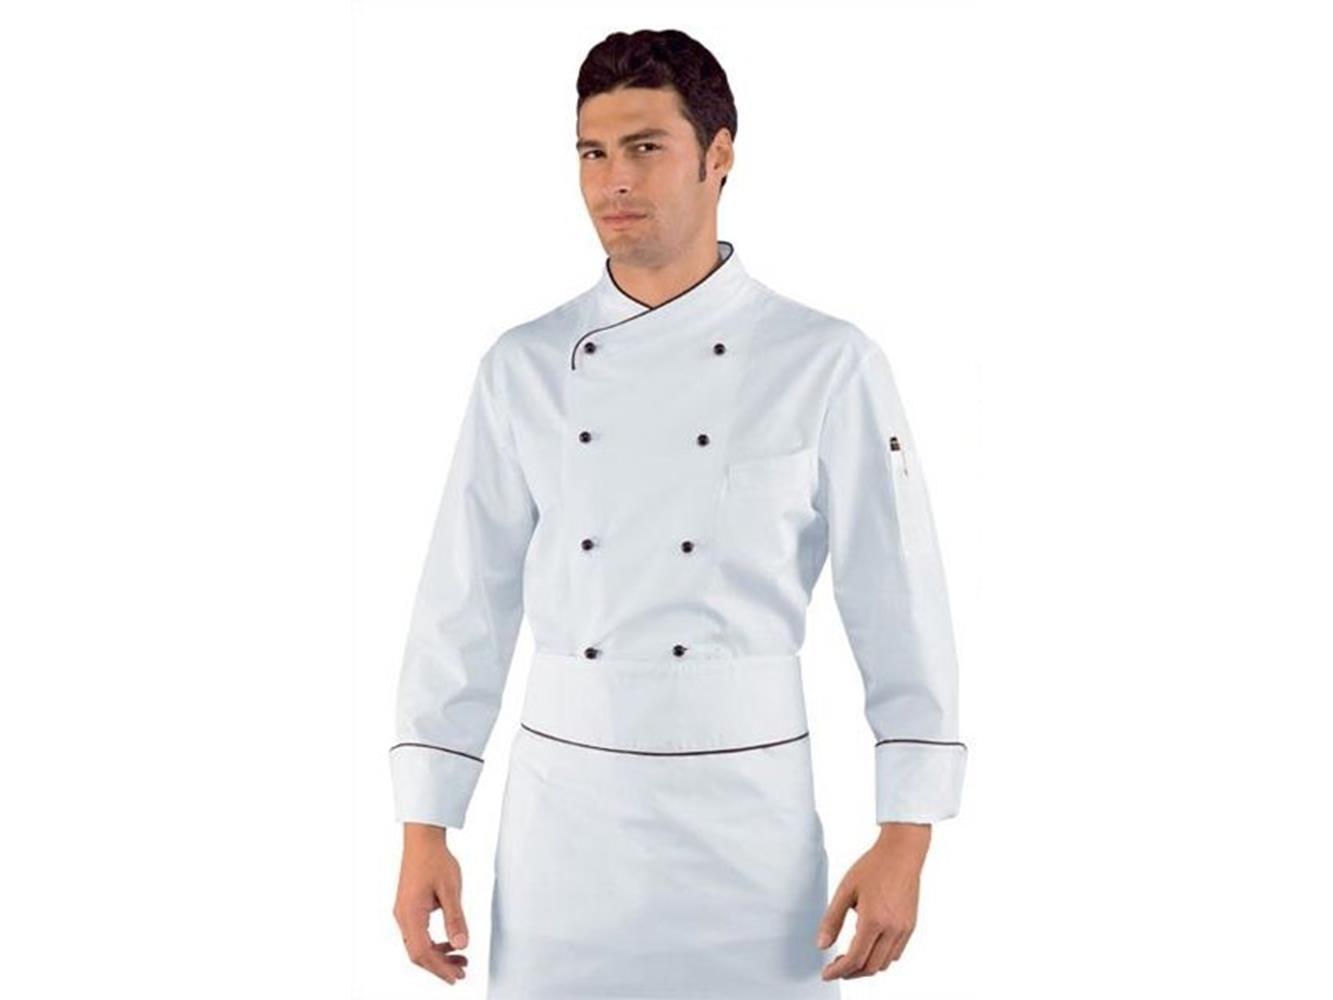 057451-g-giacca-cuoco21